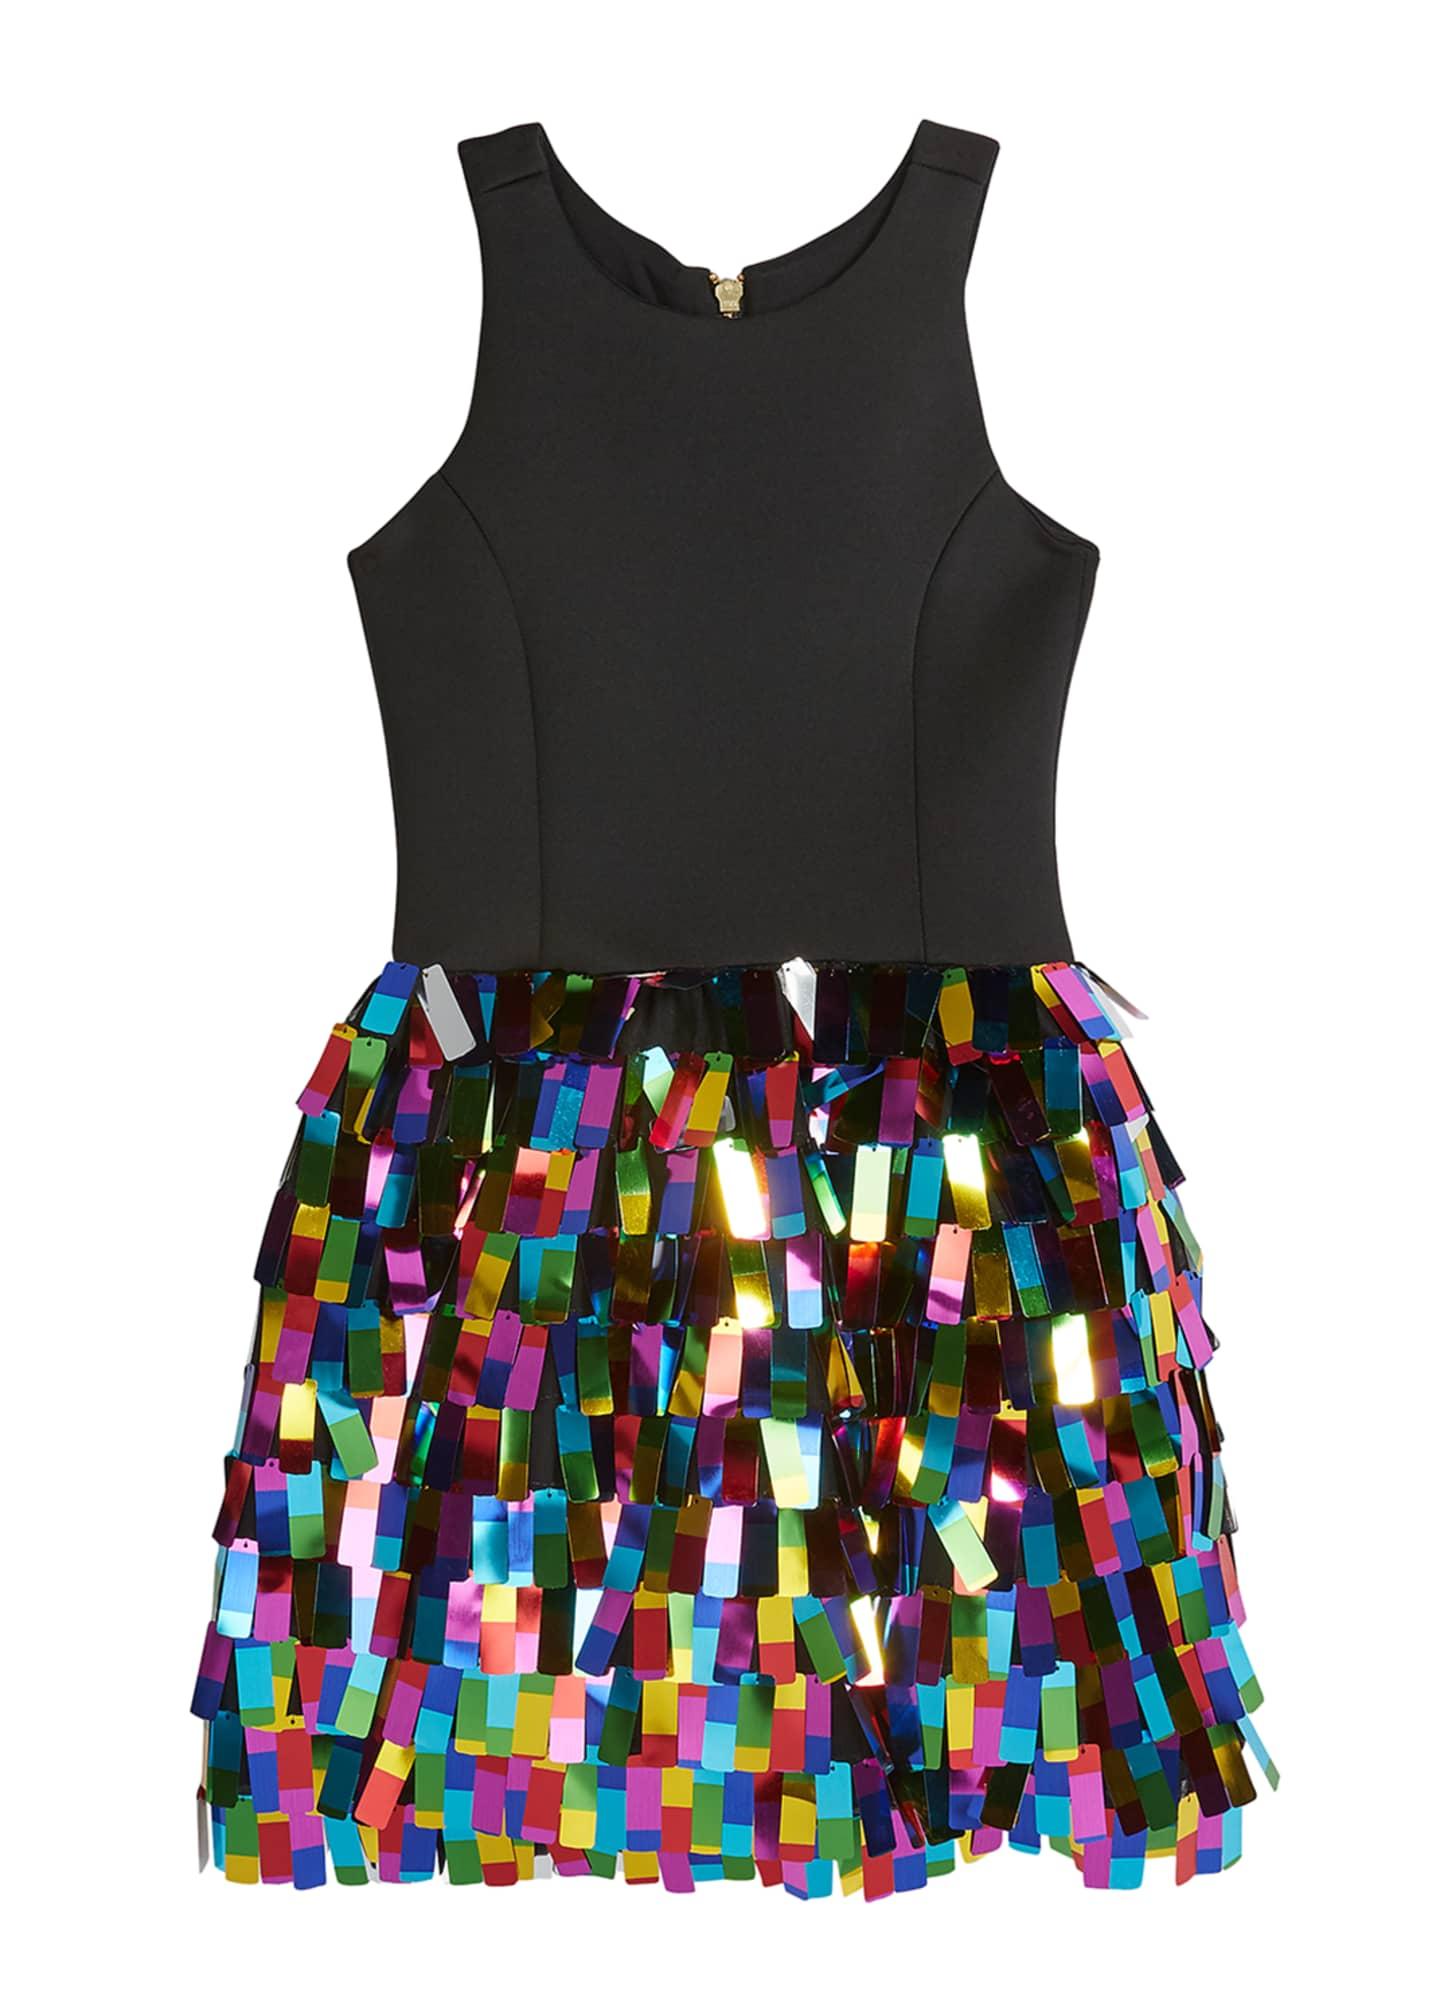 Zoe Girl's Halter Dress w/ Multicolor Rectangular Paillettes